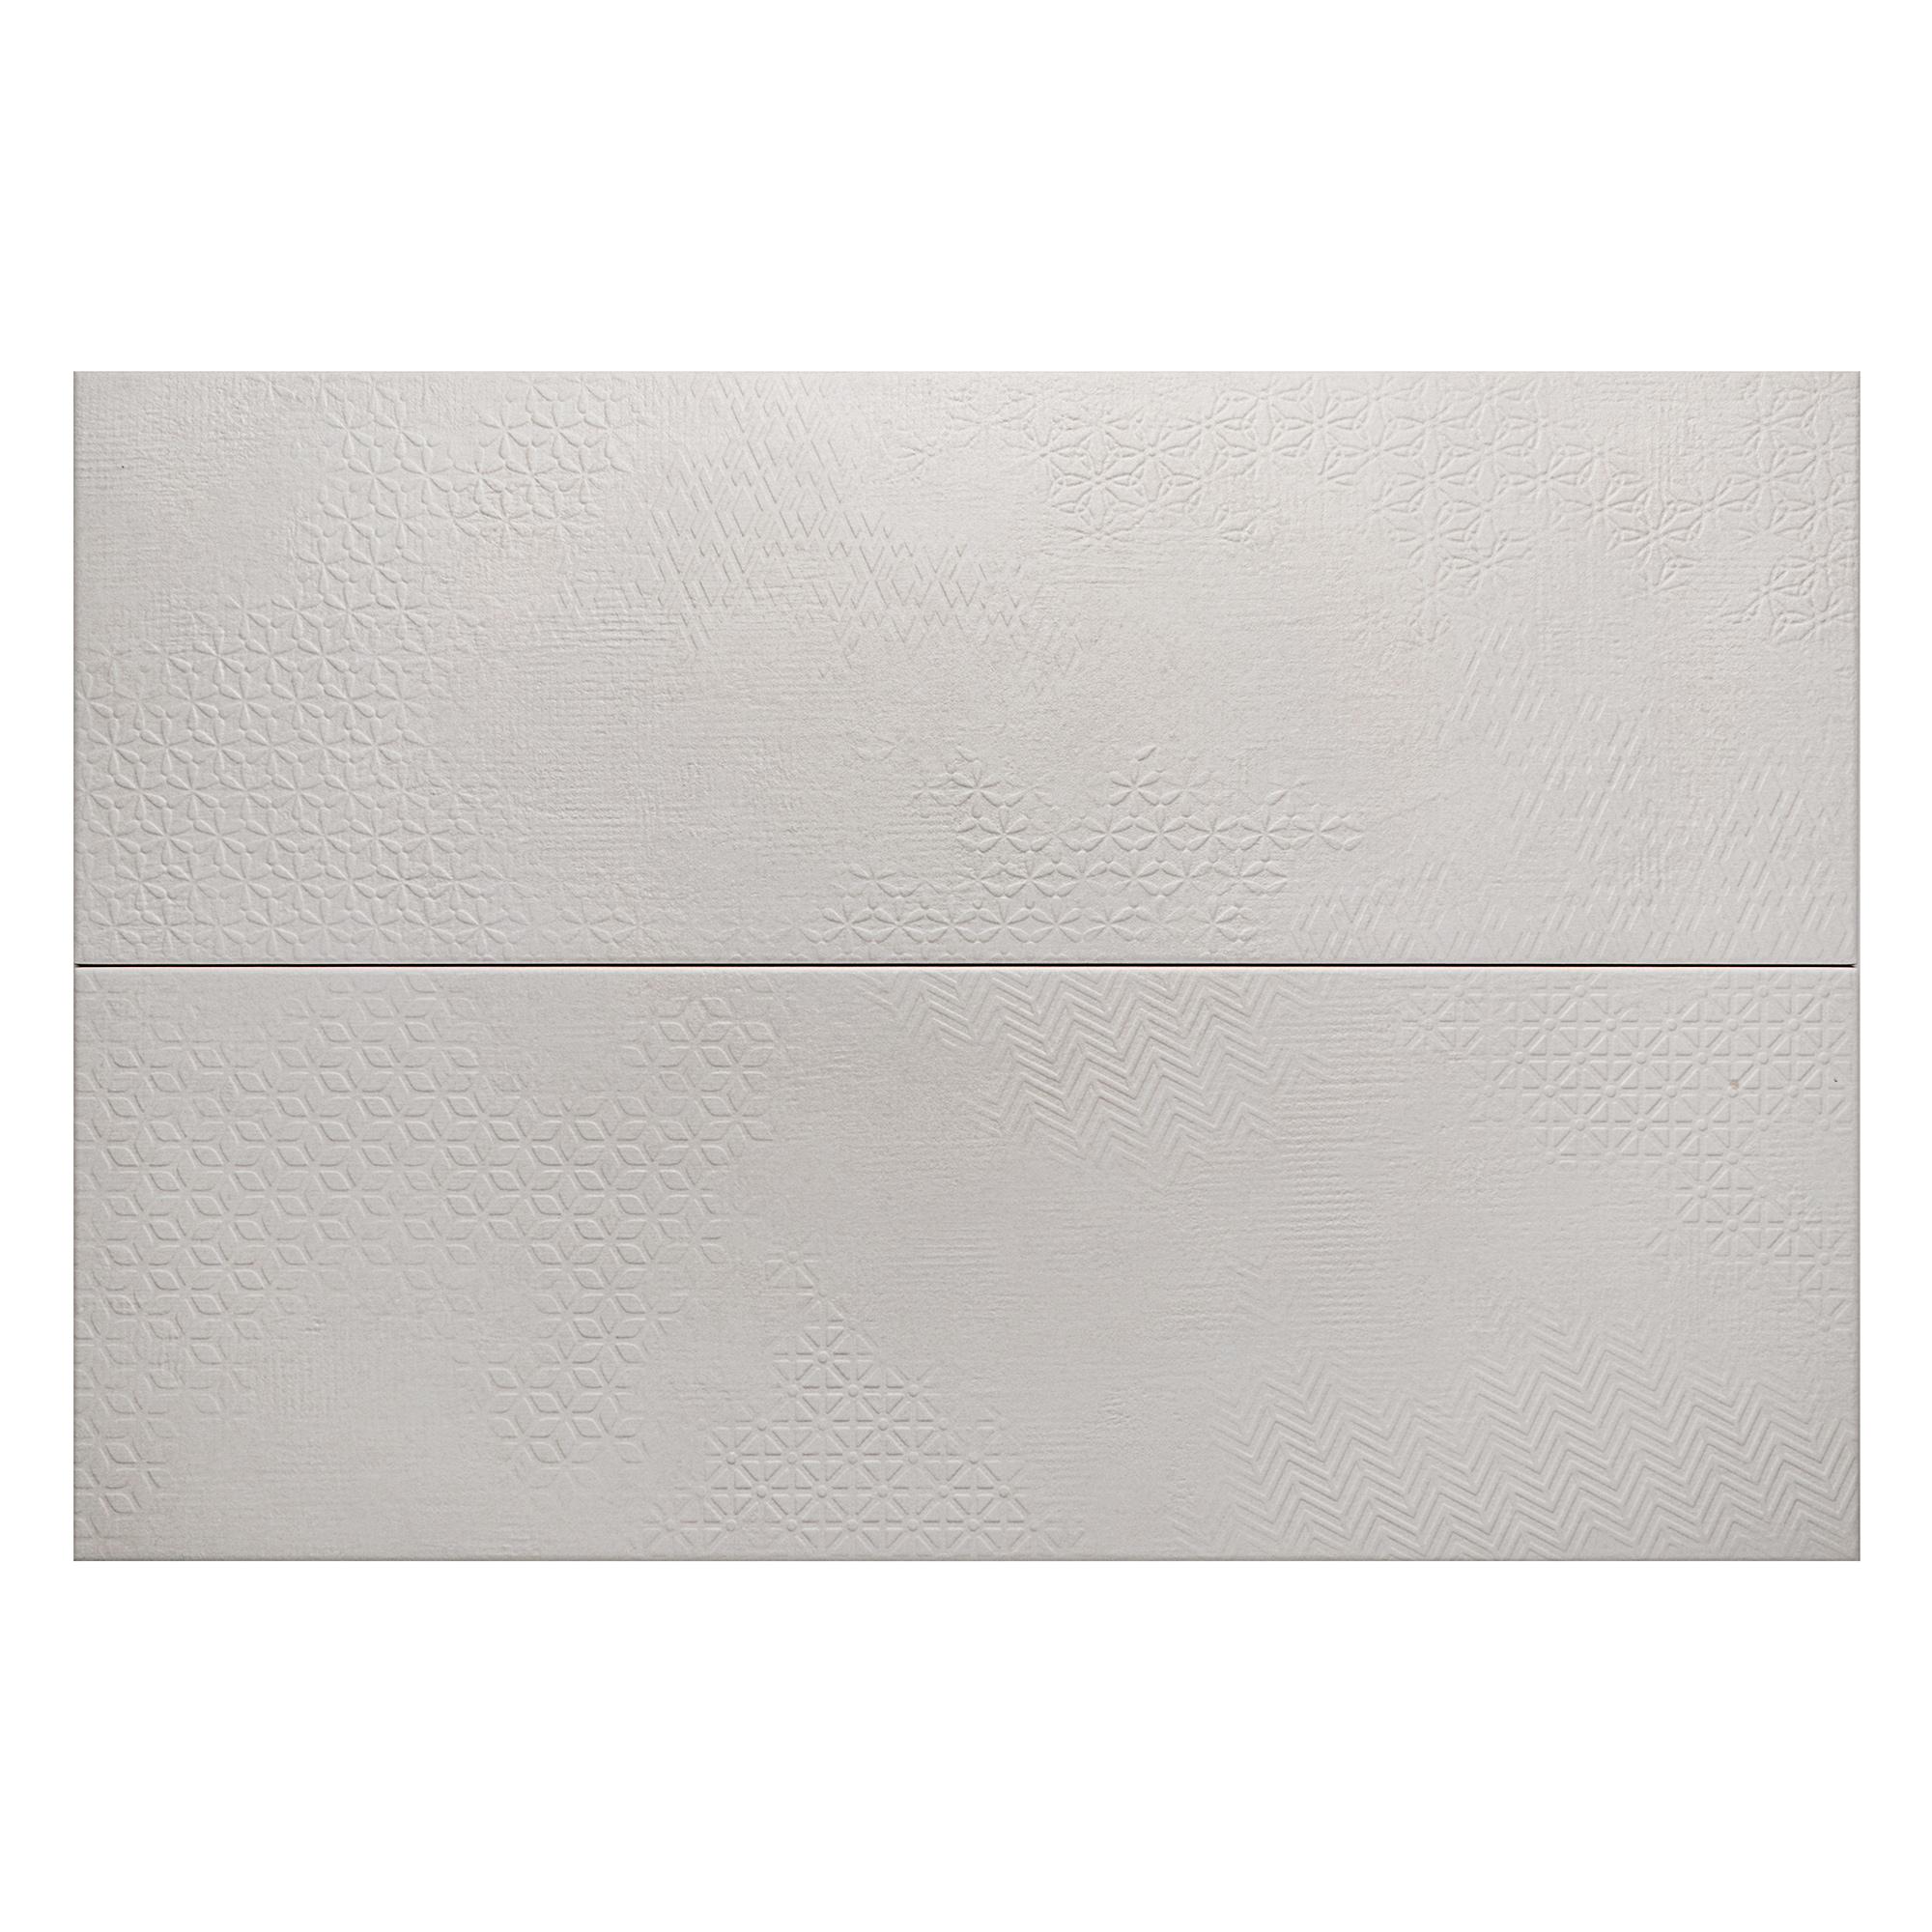 Плитка настенная Cifre relieve adua white 25x75 плитка напольная cifre hampton almond 22 5x60 уп11